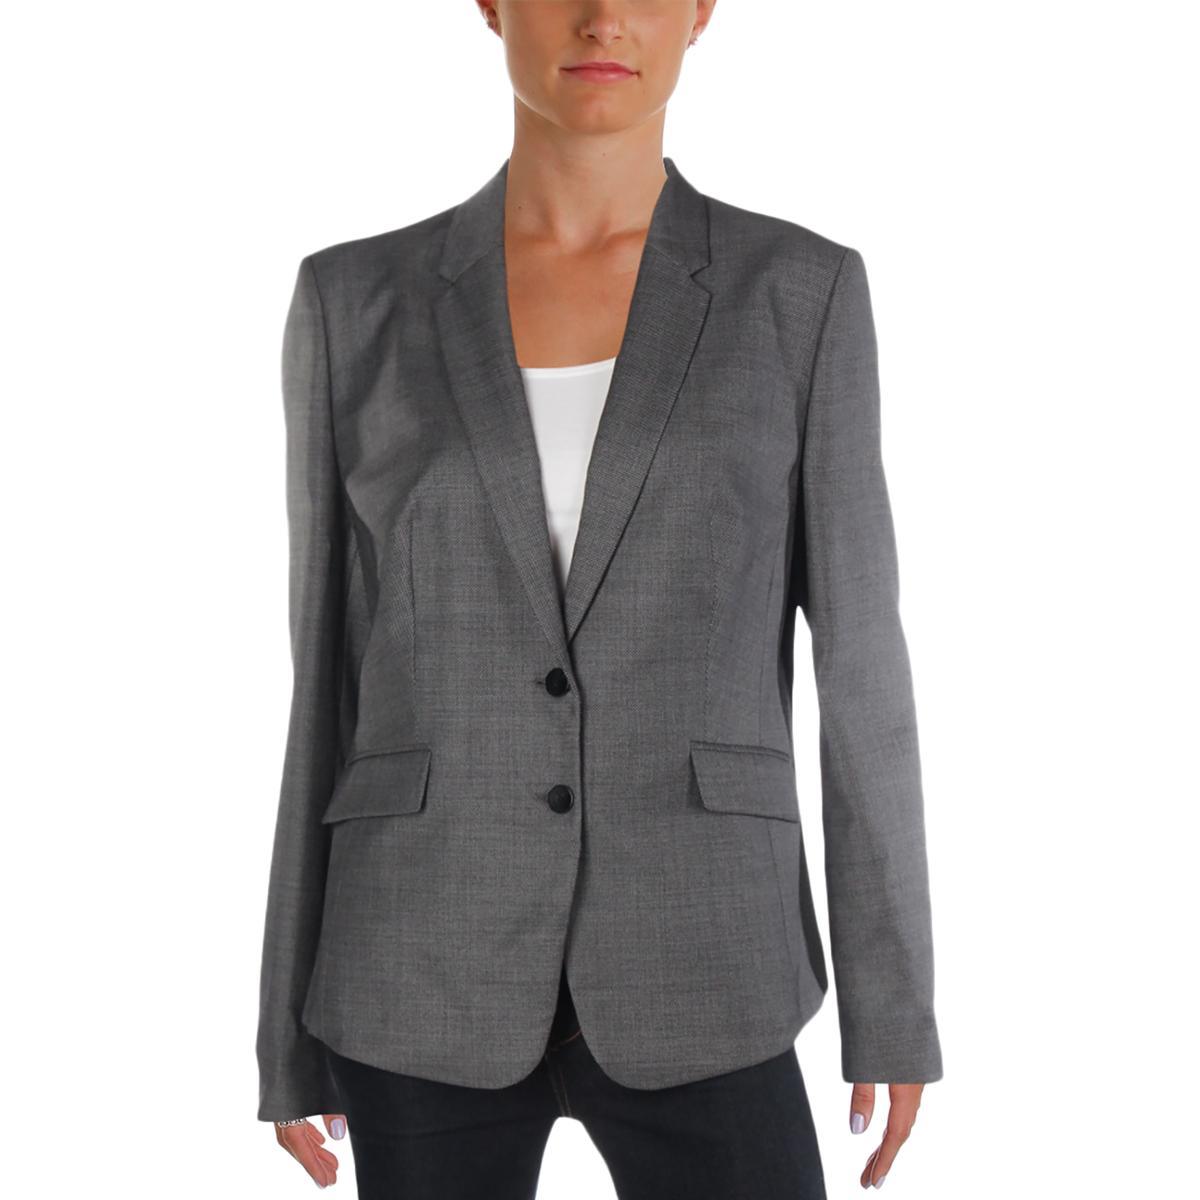 80d3139e4 Details about Hugo Boss Womens Jalinera Basic Gray Wool Business Suit  Jacket 12 BHFO 1764